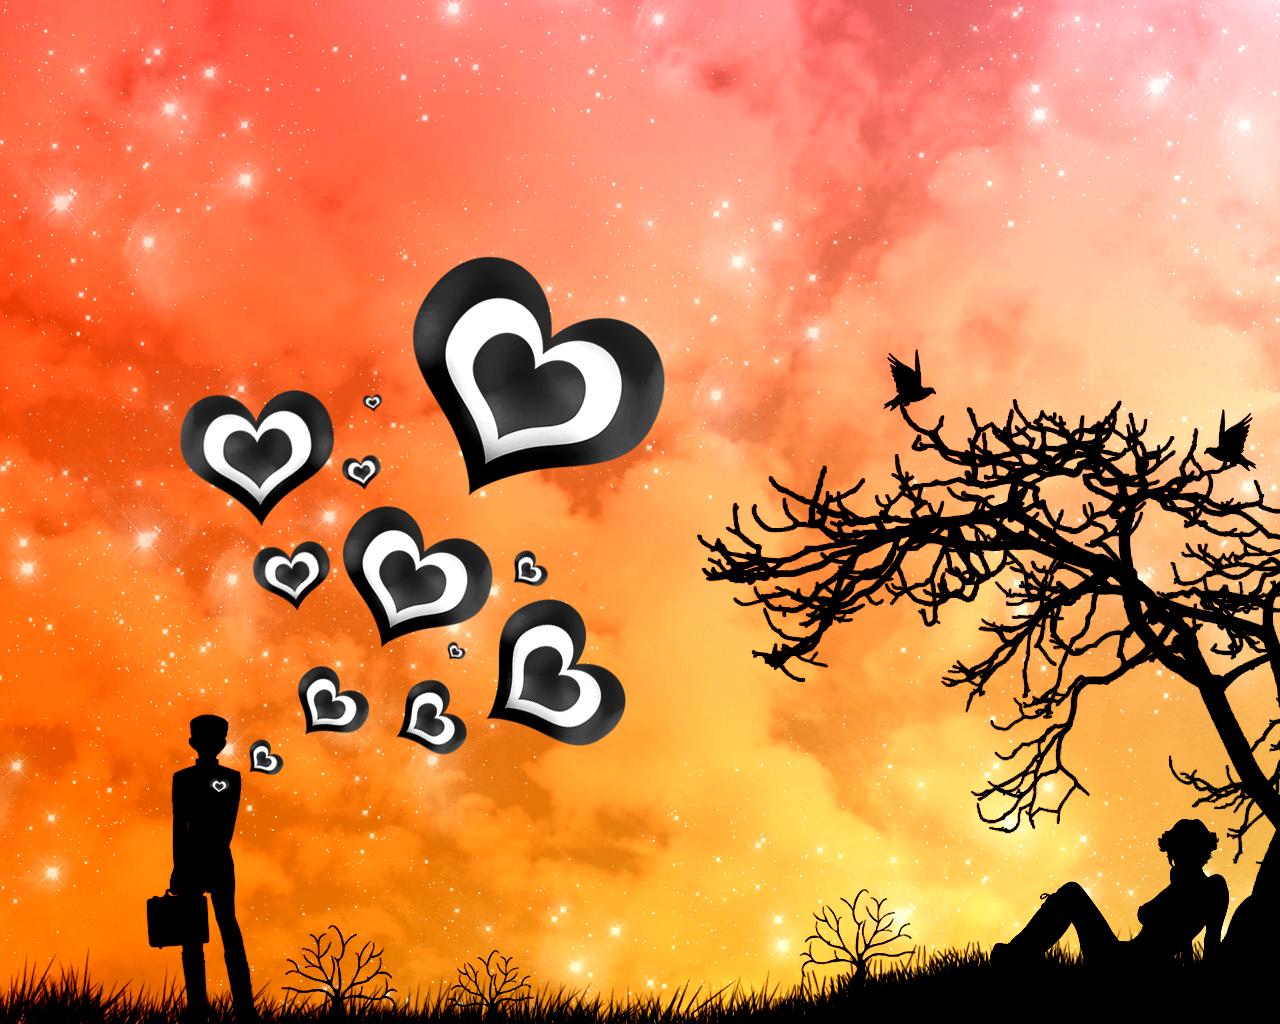 Best Love Wallpapers: Love Wallpapers HD:wallpapers Screensavers